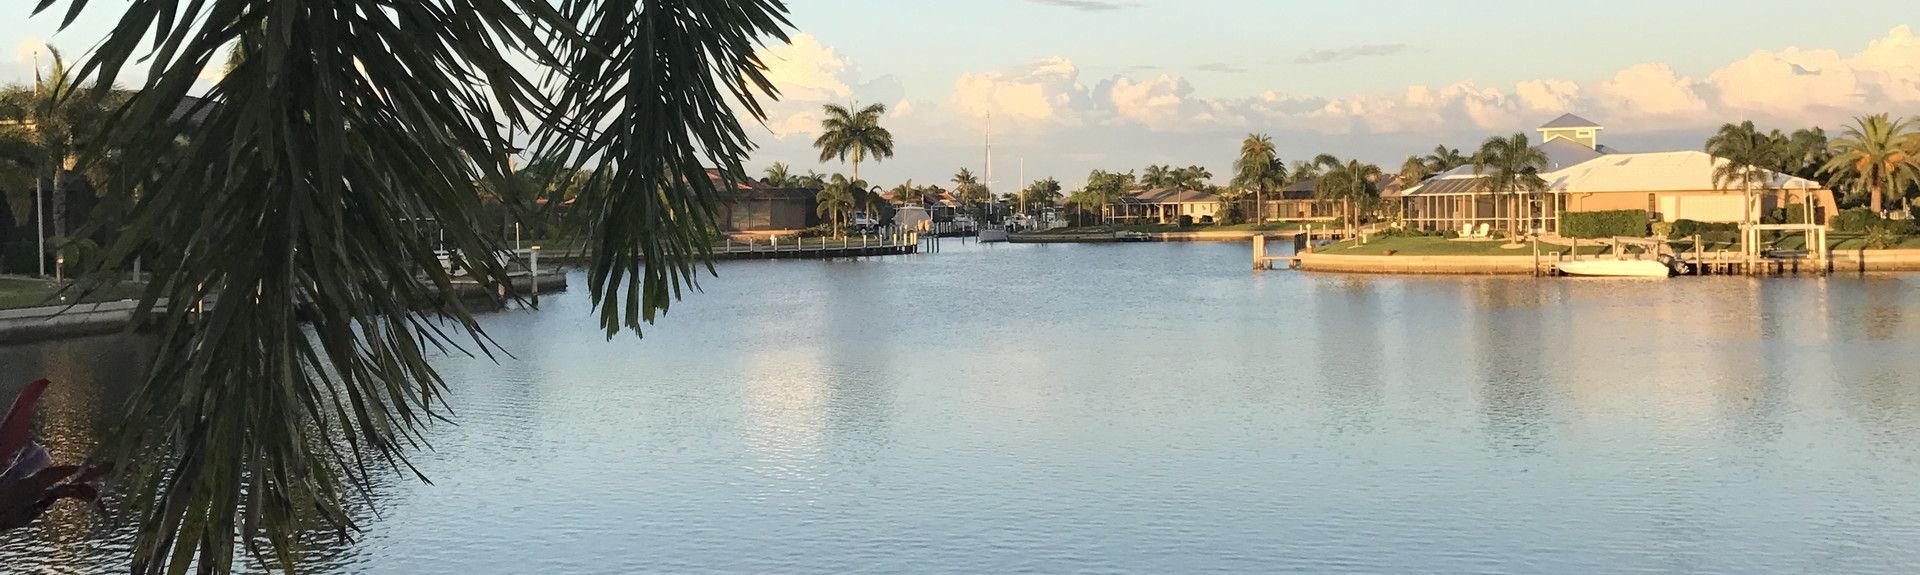 Punta Gorda Isles (Punta Gorda, Φλόριντα, Ηνωμένες Πολιτείες)